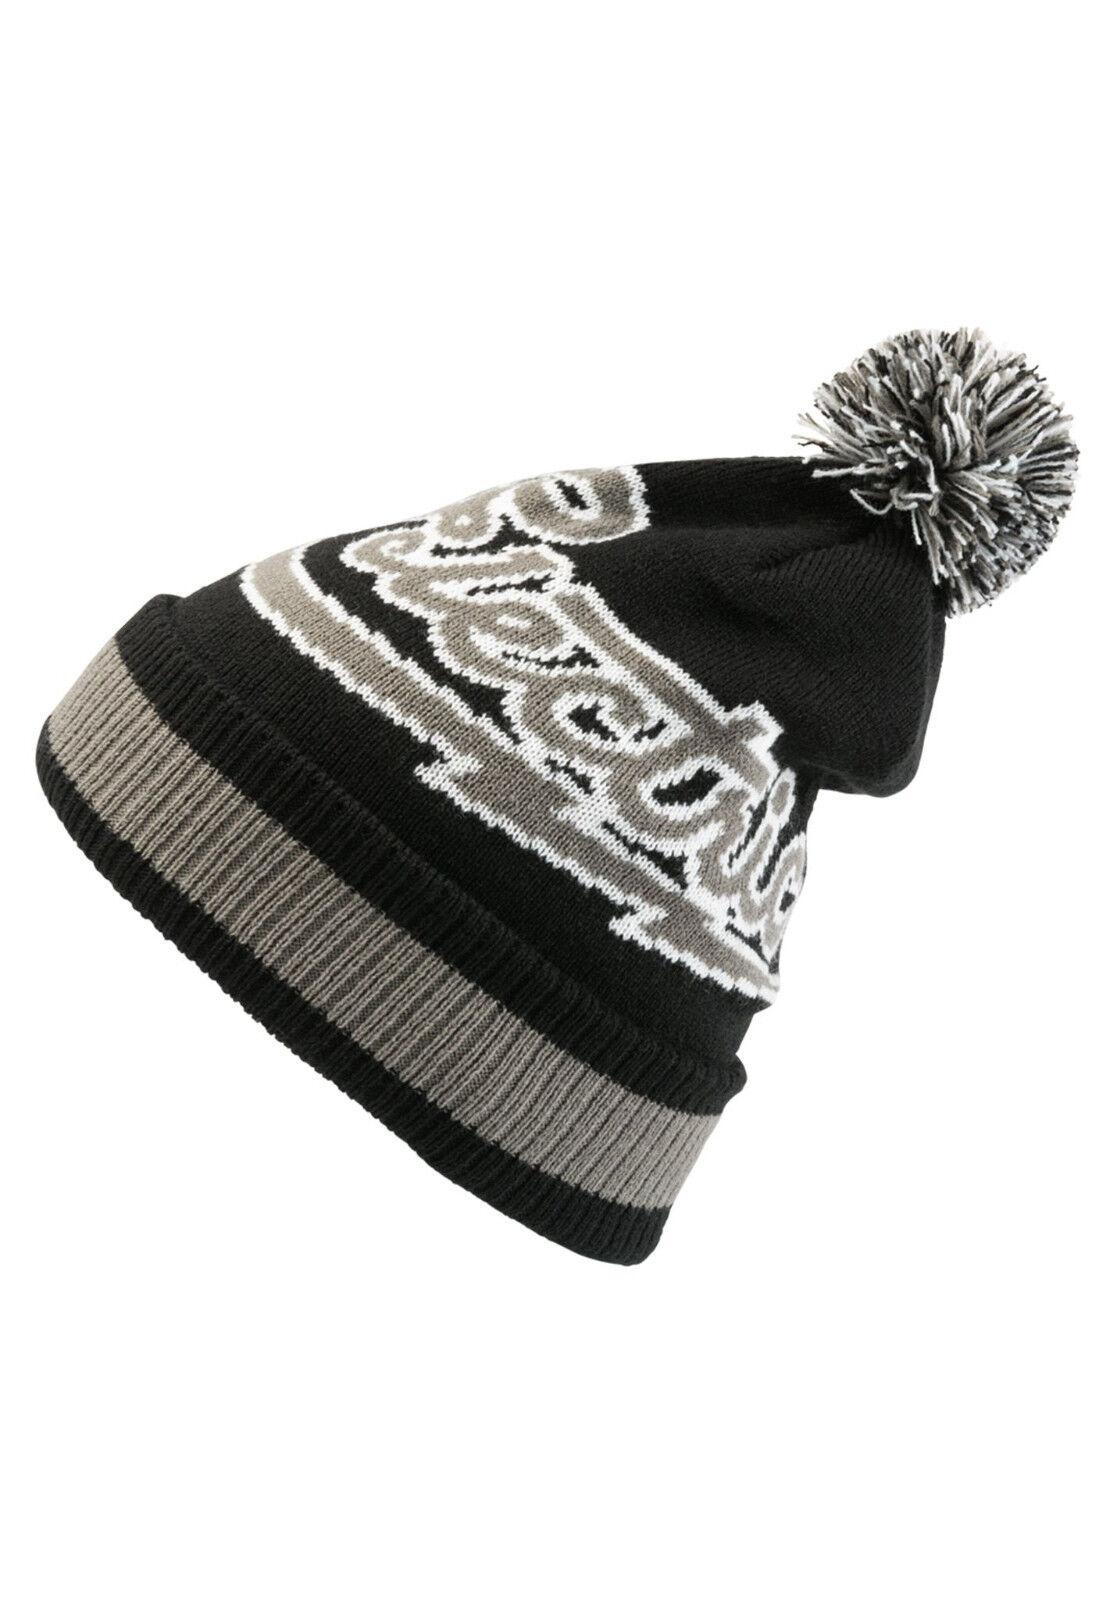 ELECTRIC Mascot Mens Beanie NEW Black CAP Rolled Cuff POM BEENIE CAP Black Free Shipping a842c4